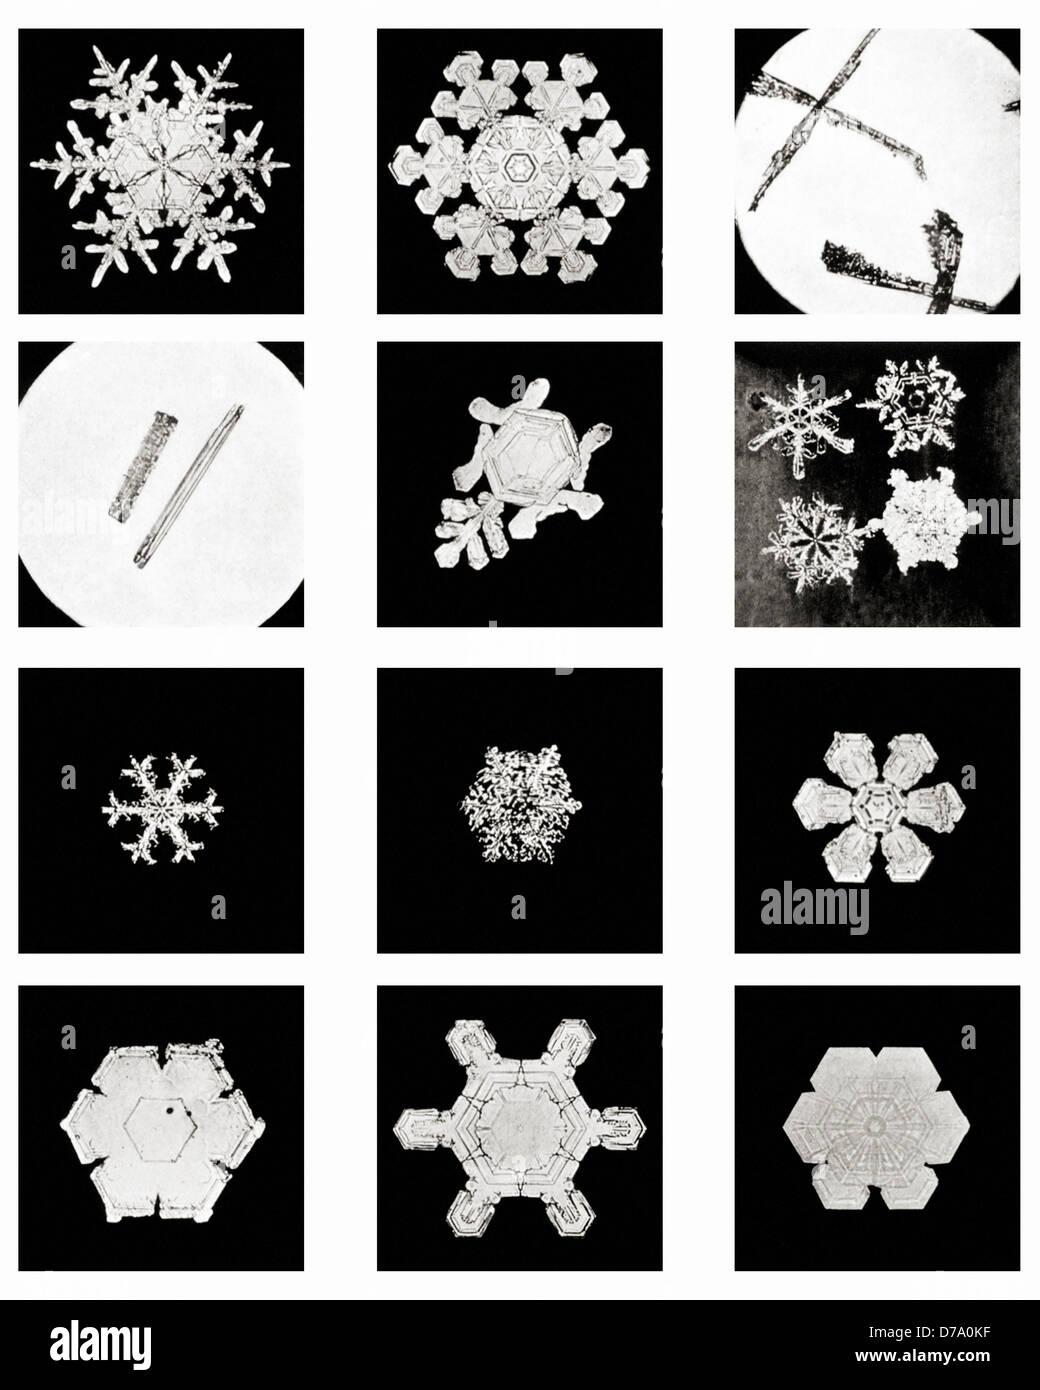 Plate IV Studies Among Snow Crystals - Stock Image